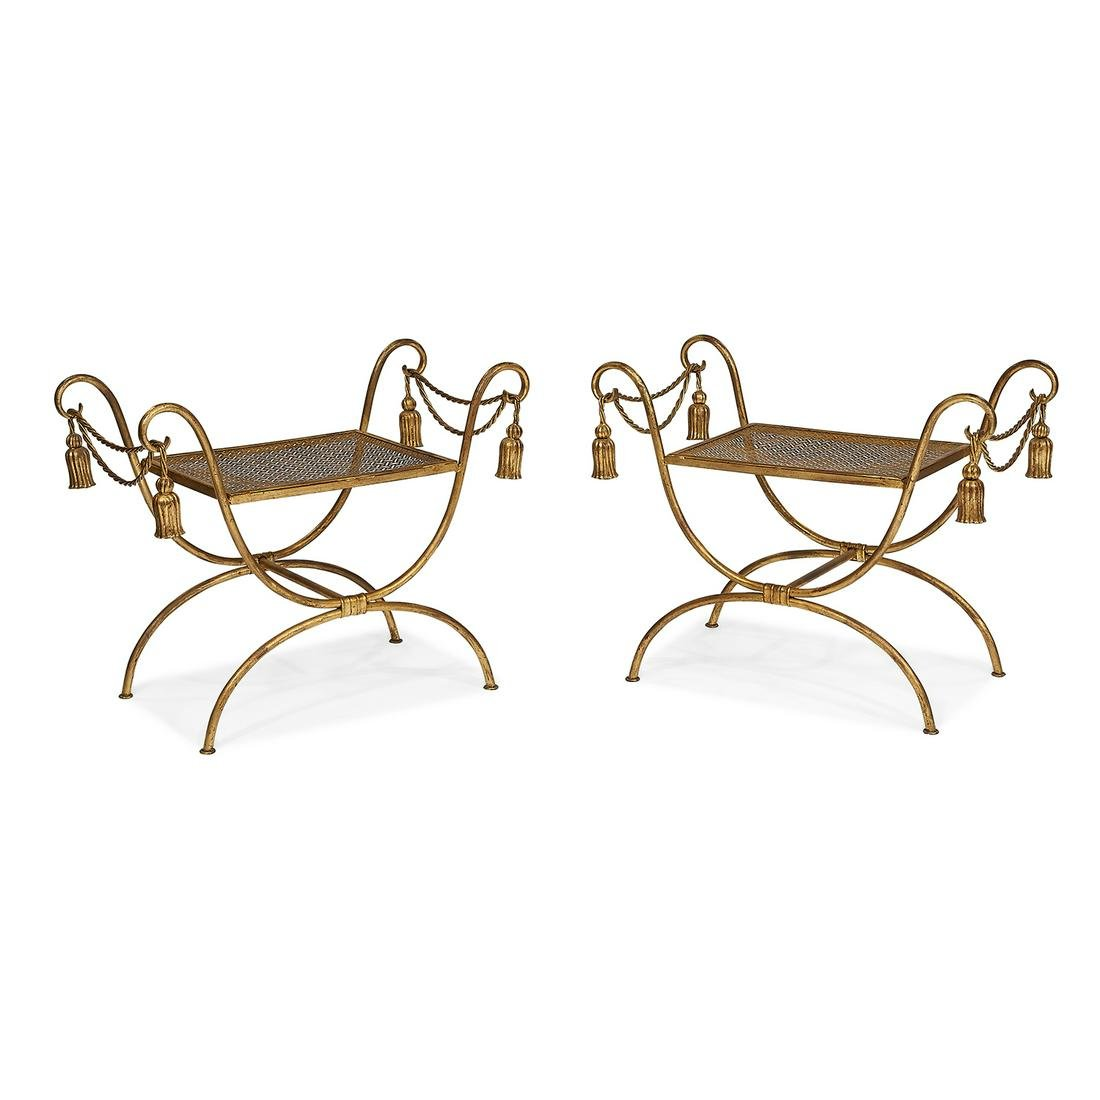 Italian benches, pair